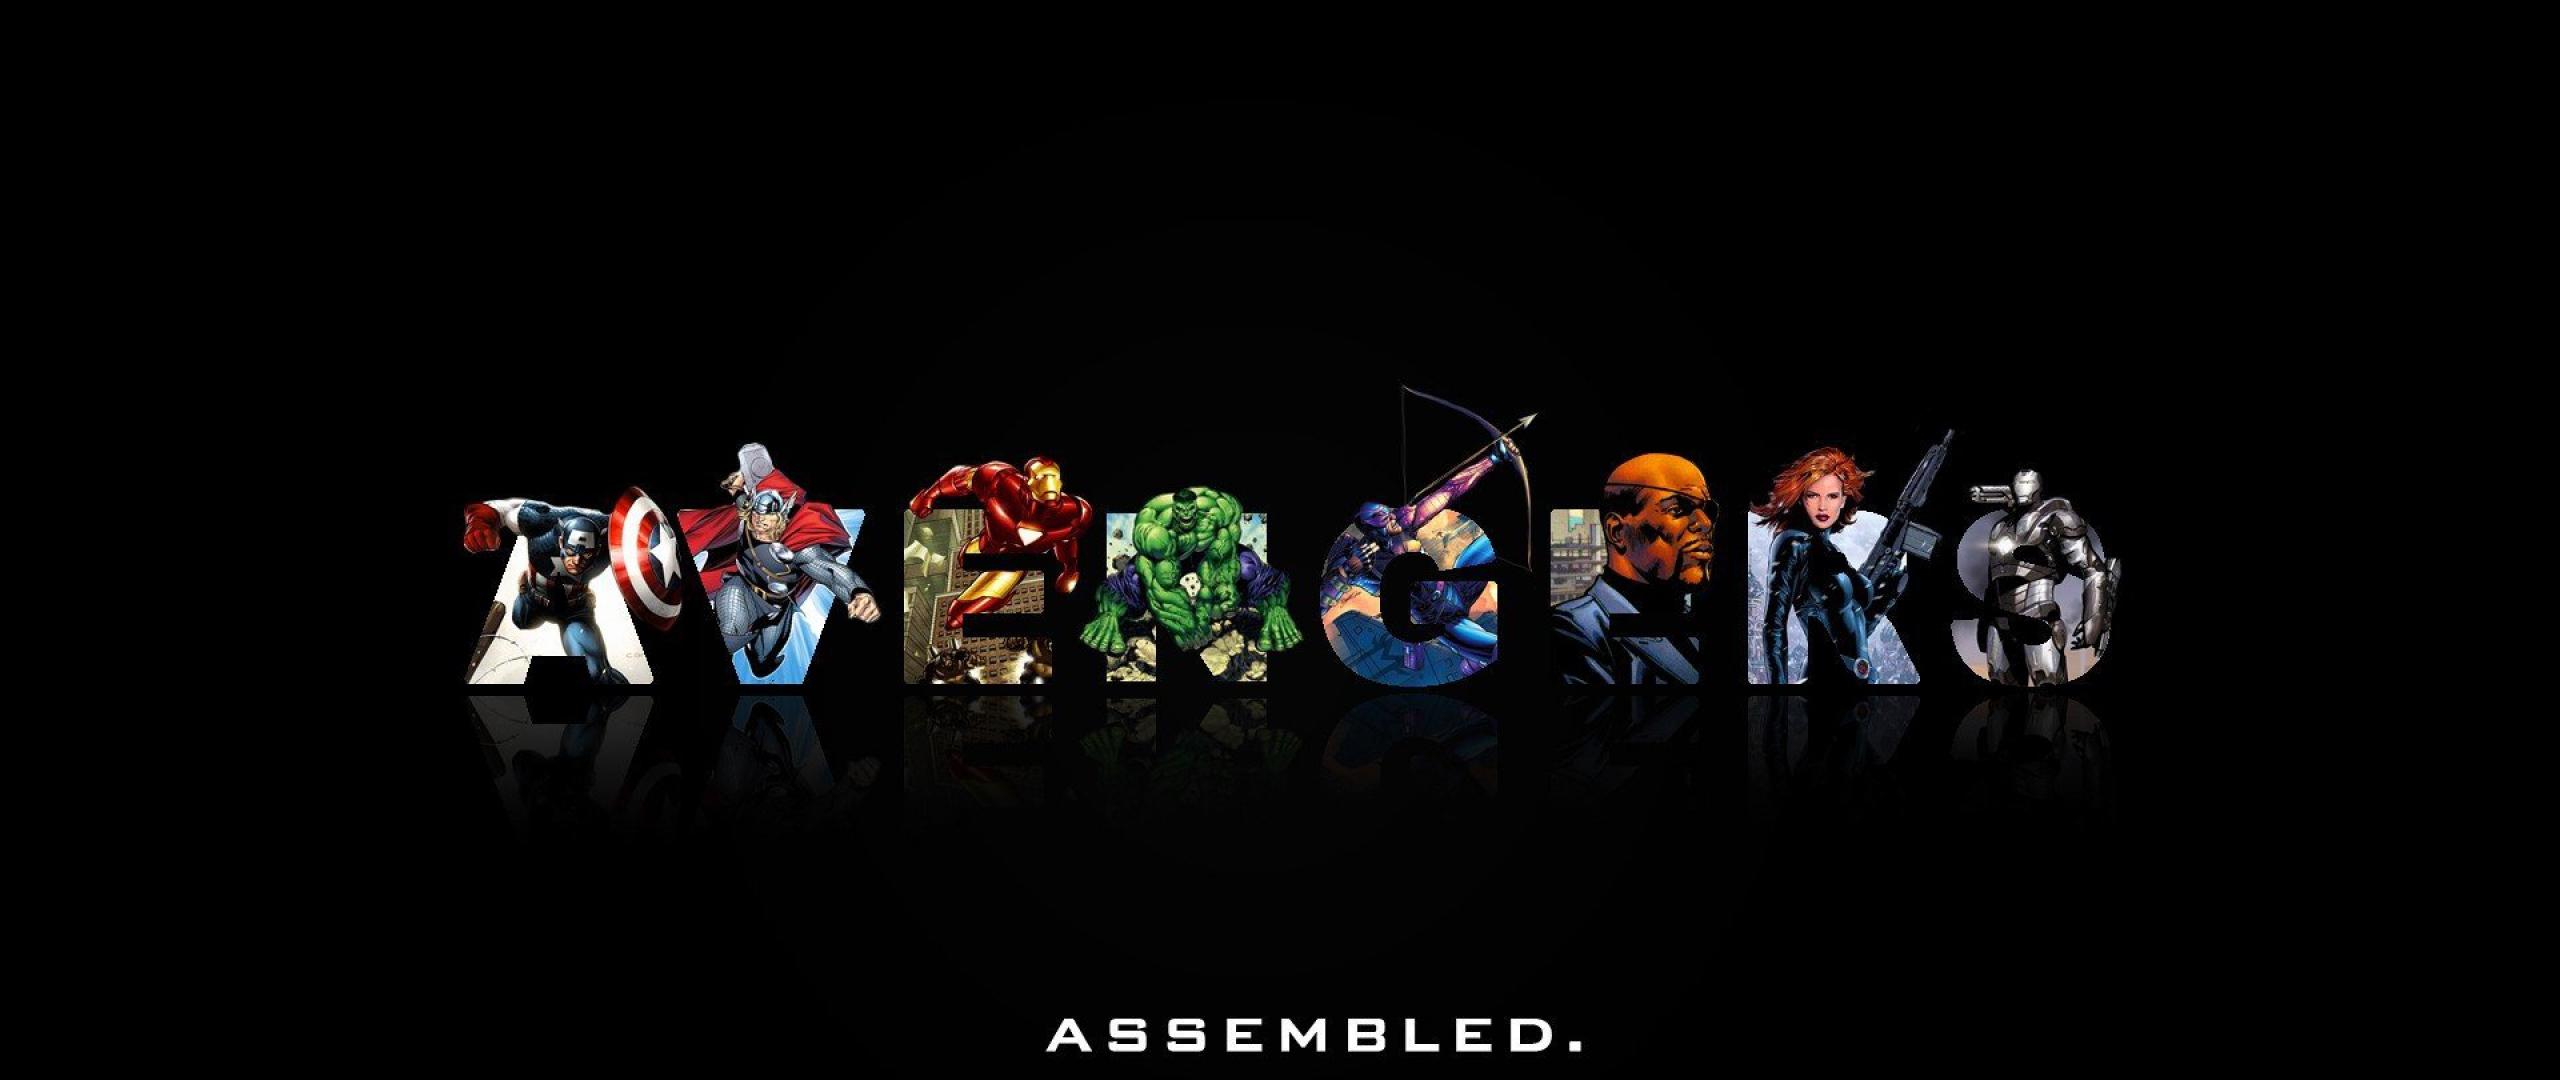 The Avengers Desktop Wallpaper   Avengers Live Images HD 2560x1080